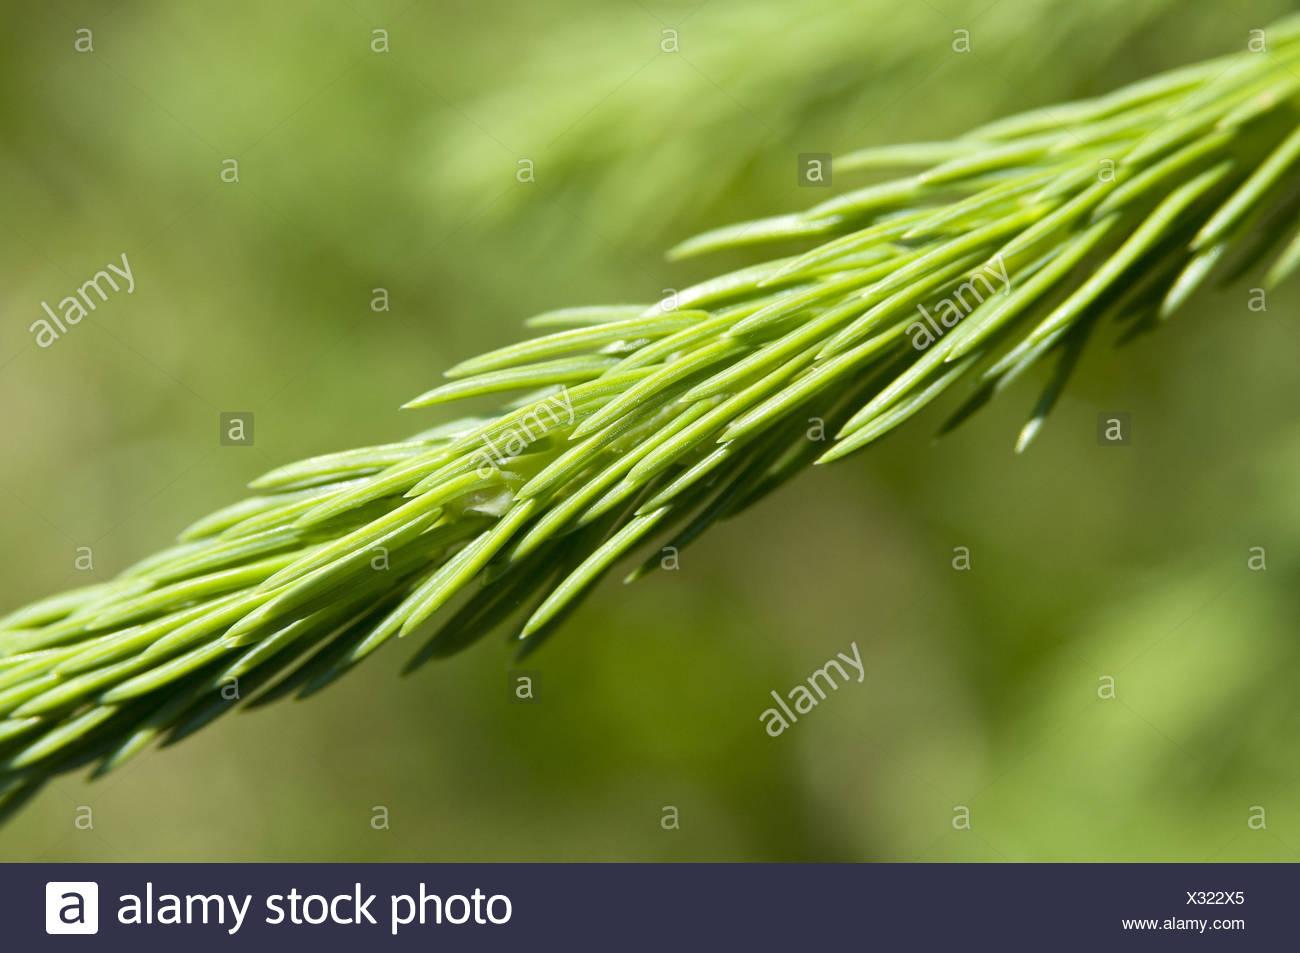 Conifer, branch, detail, instinct, - Stock Image